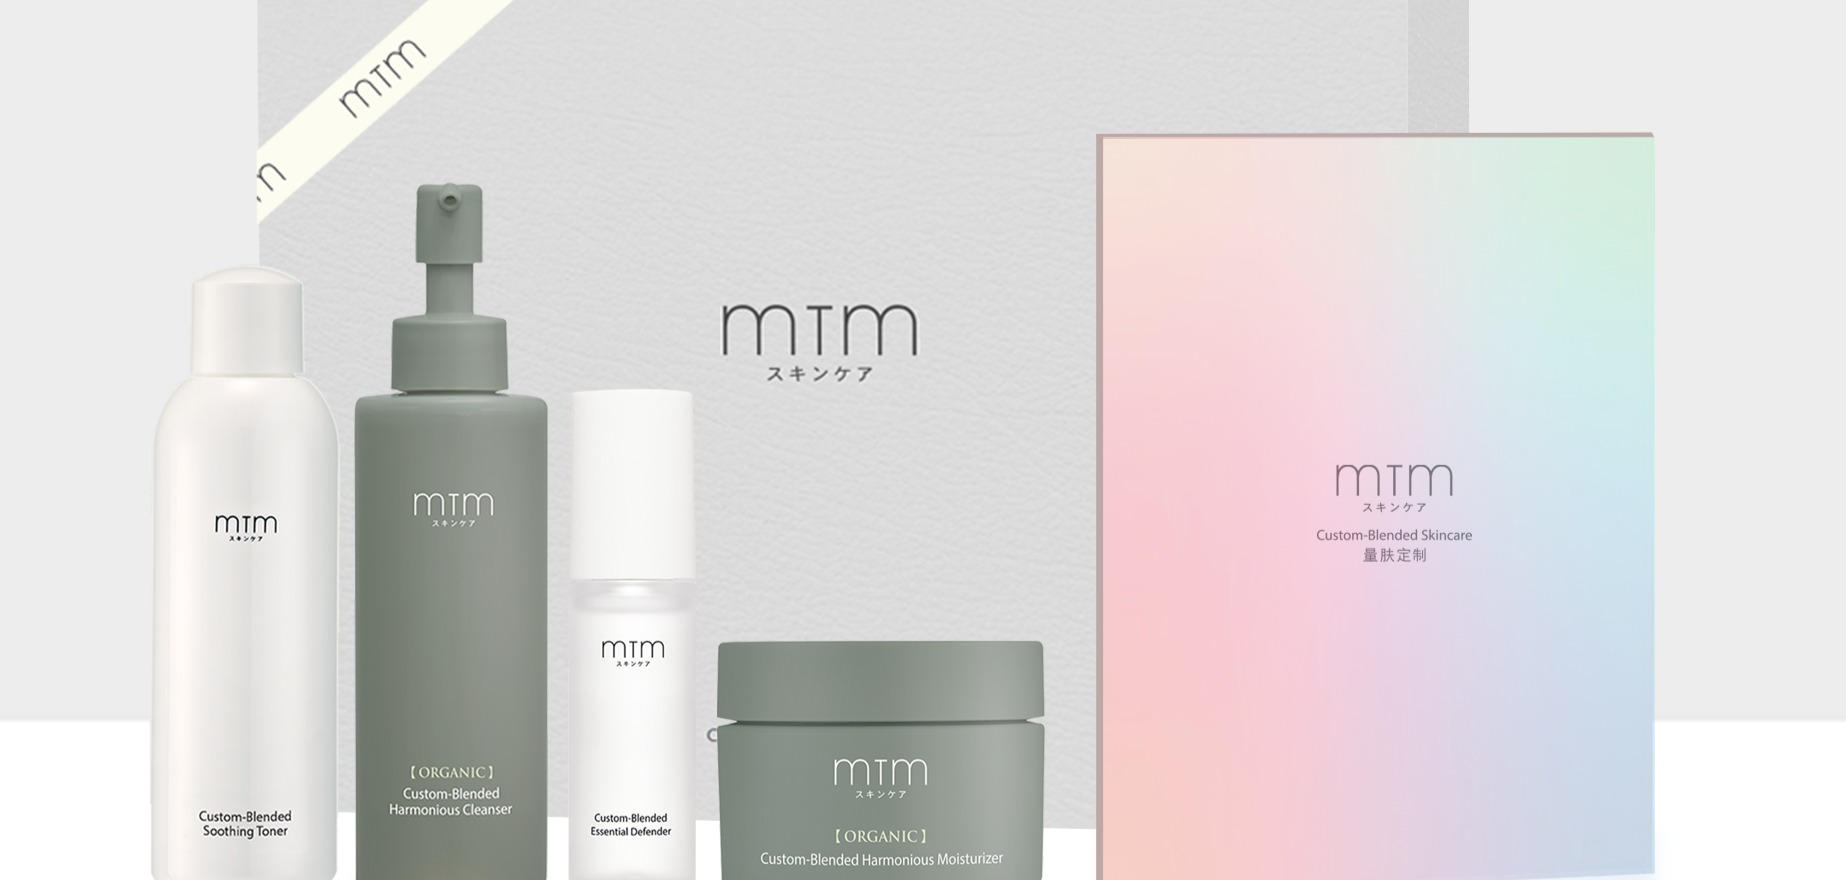 MTM Gift Set (worth $886)